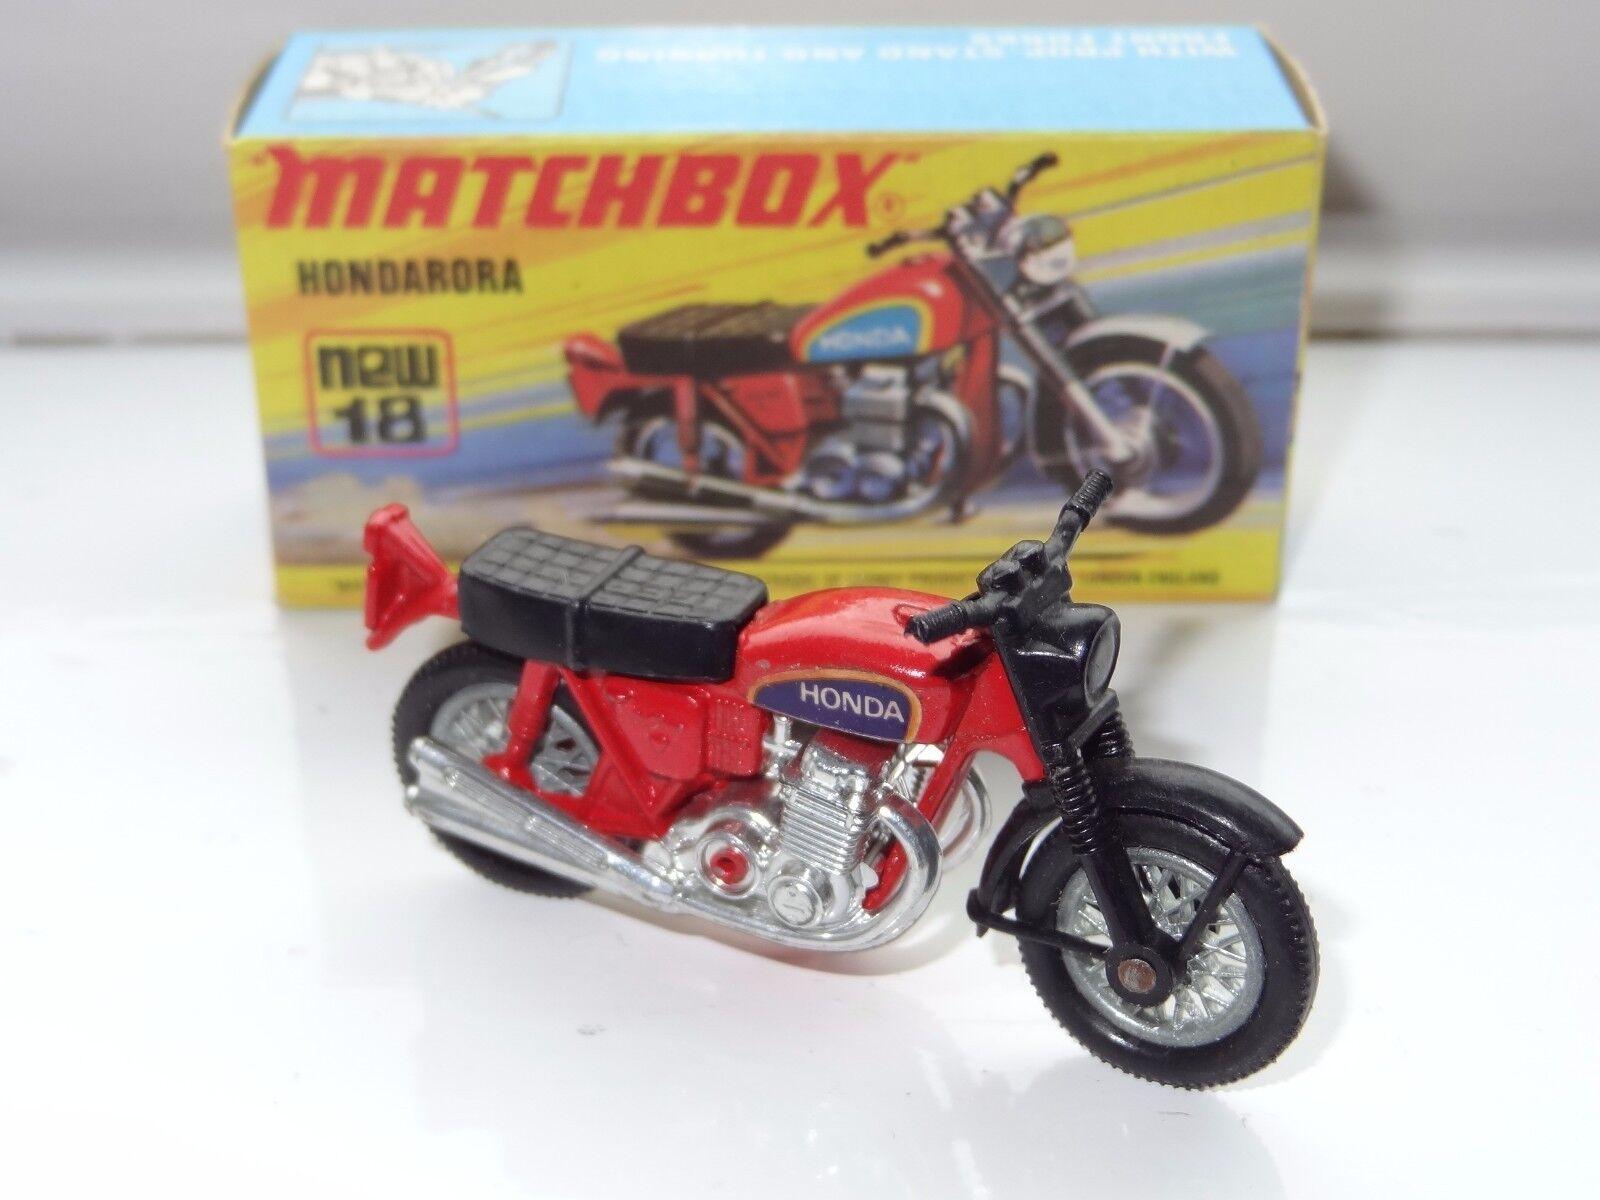 (K) lesney matchbox SUPERFAST HONDARORA MOTOR CYCLE - 18